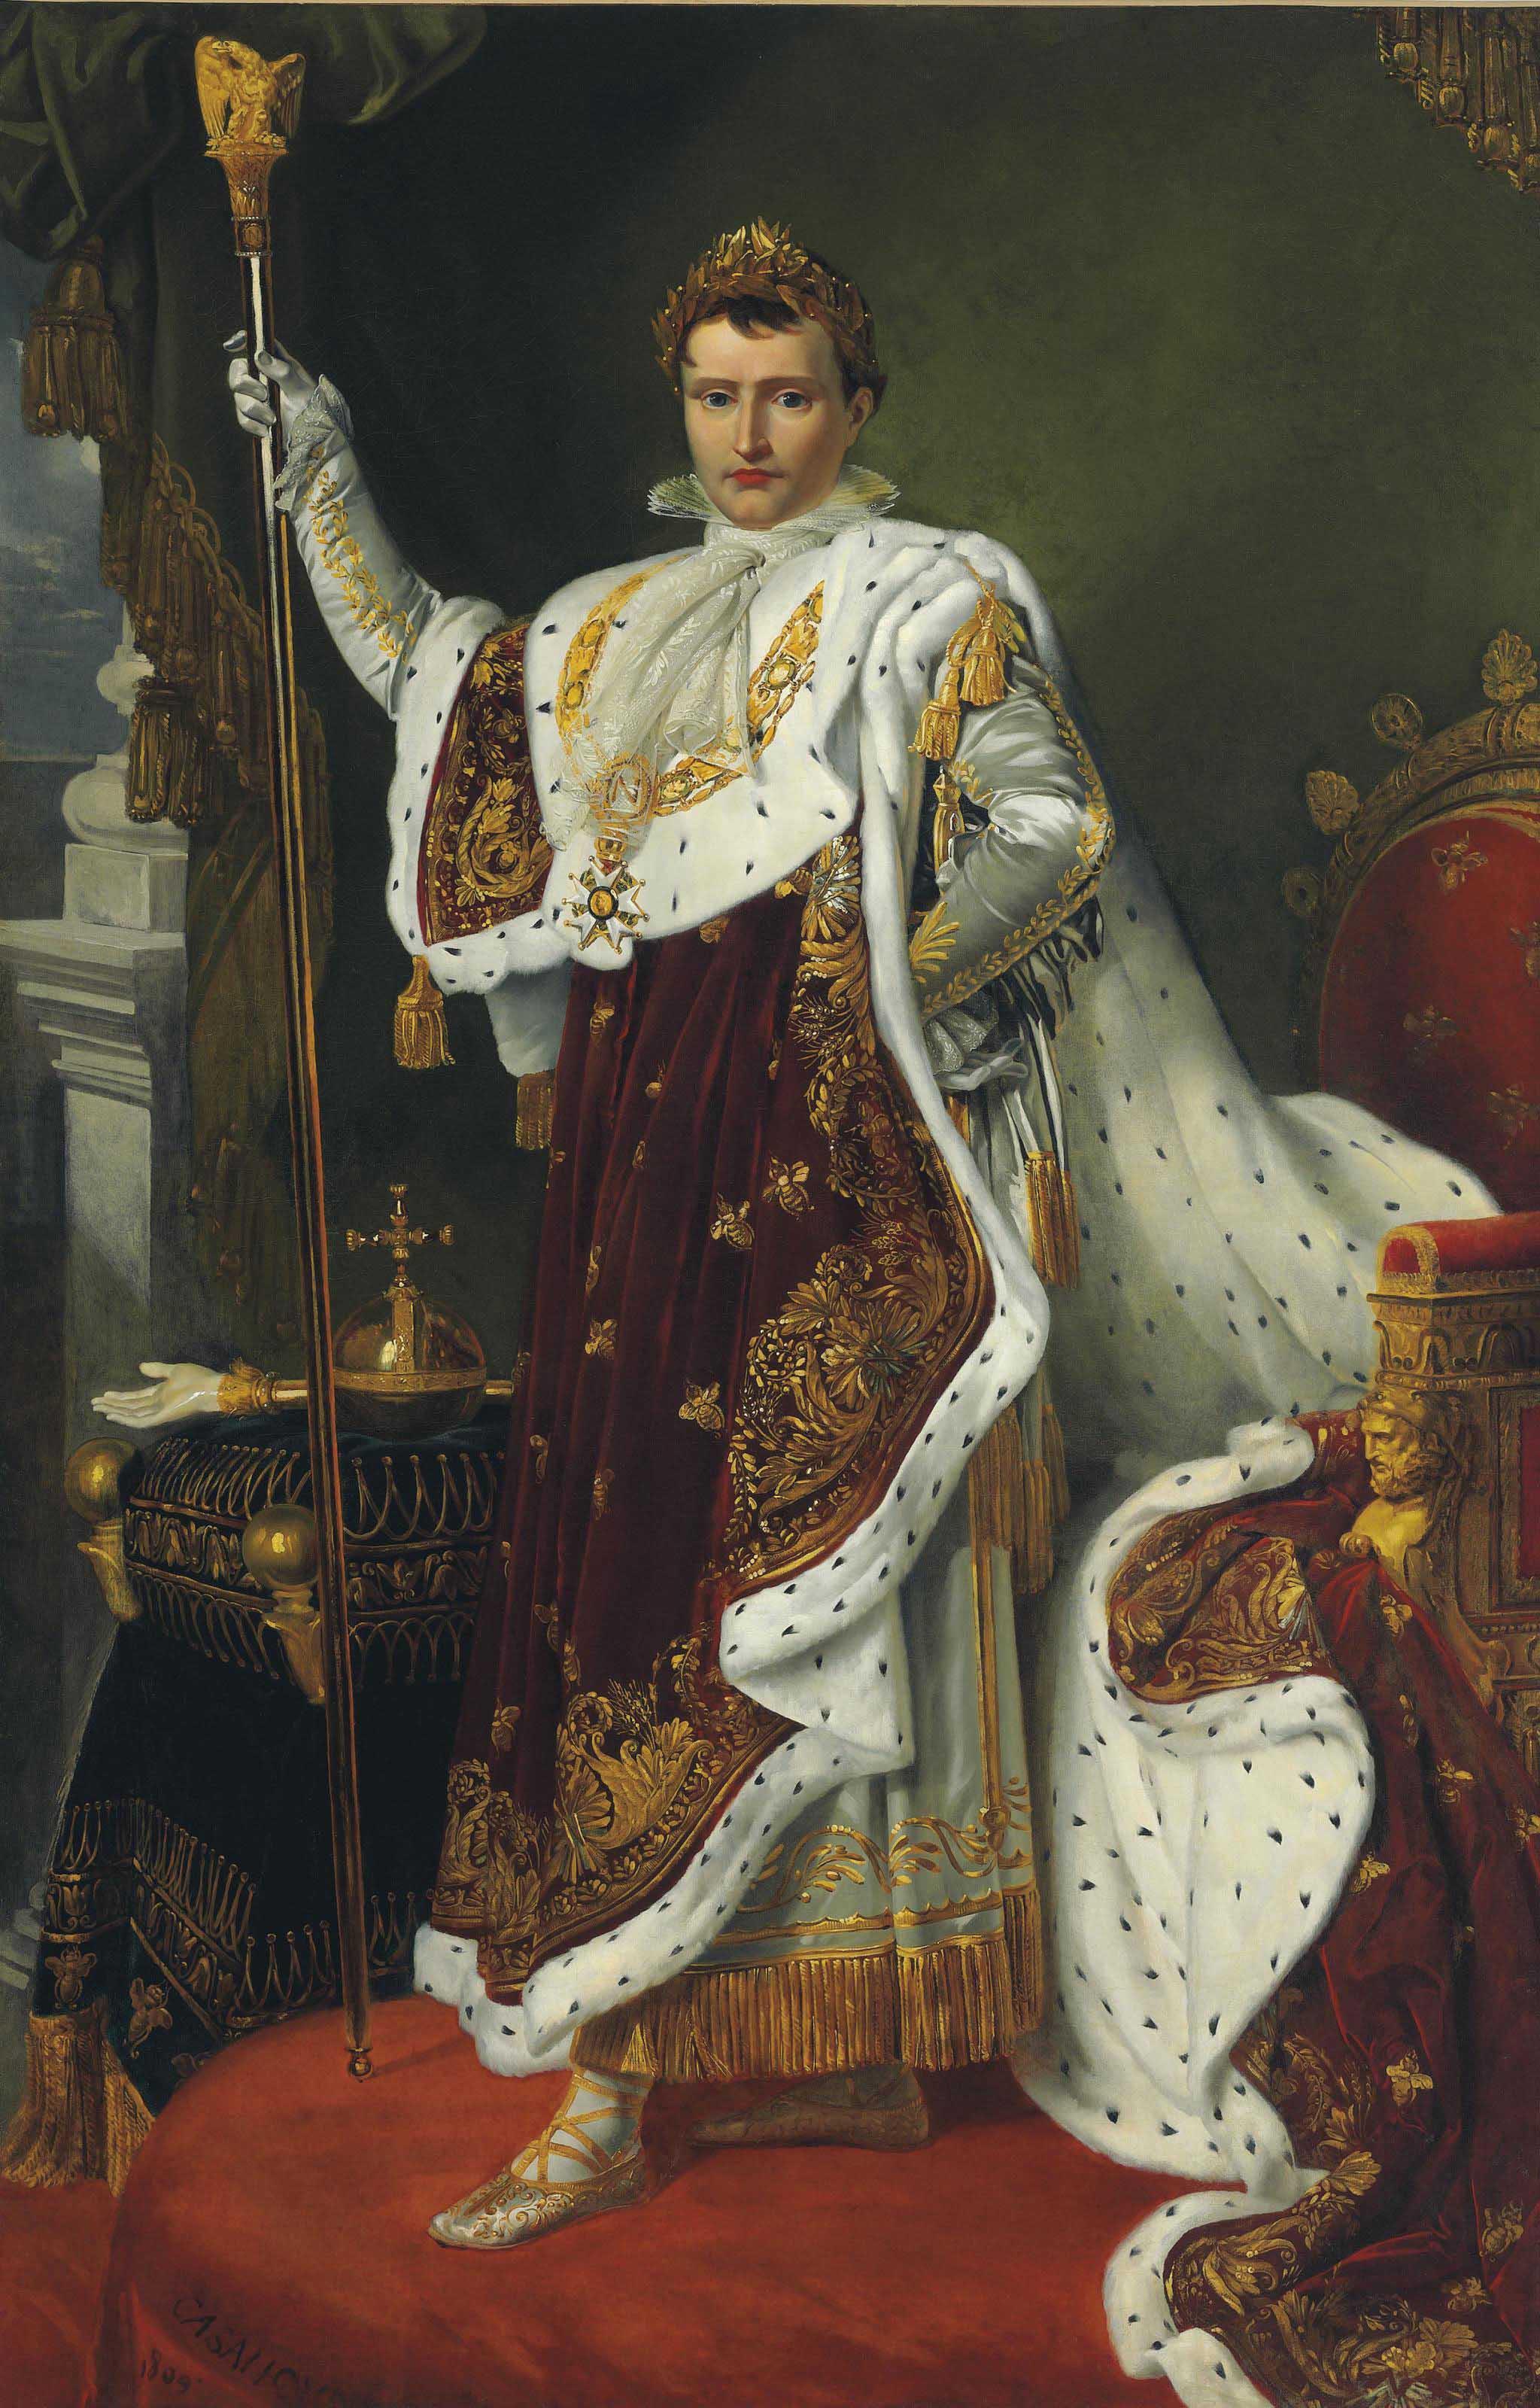 Portrait of the Emperor Napoleon Bonaparte (1769-1821), full-length, in coronation robes